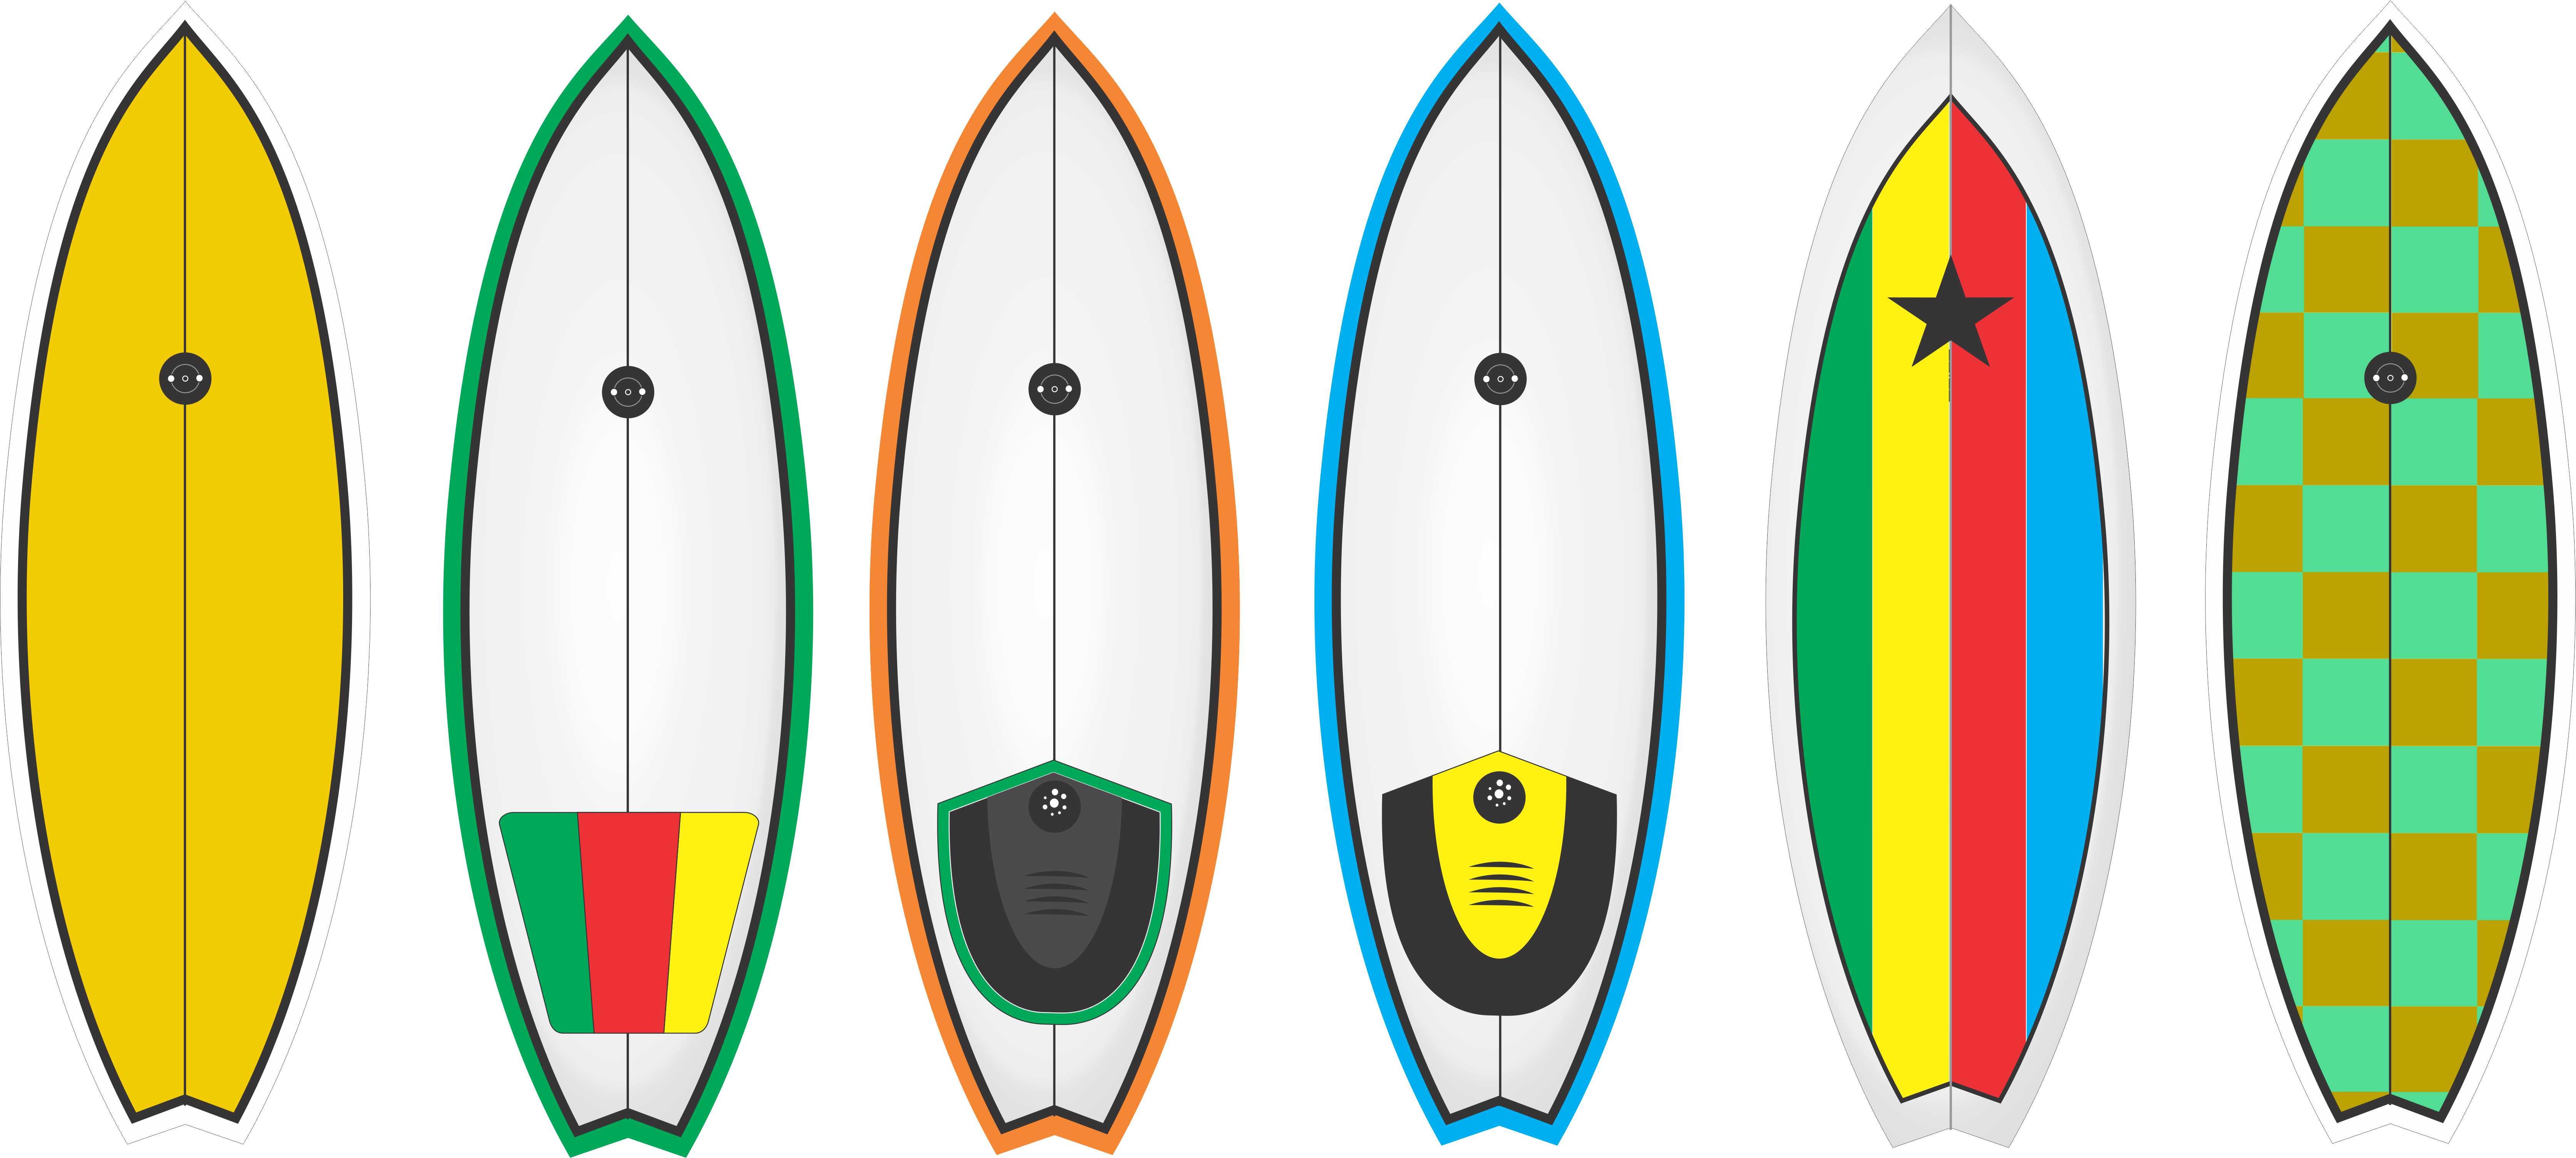 adesivos prancha de surf no elo7 efeito wood 9cdd7a